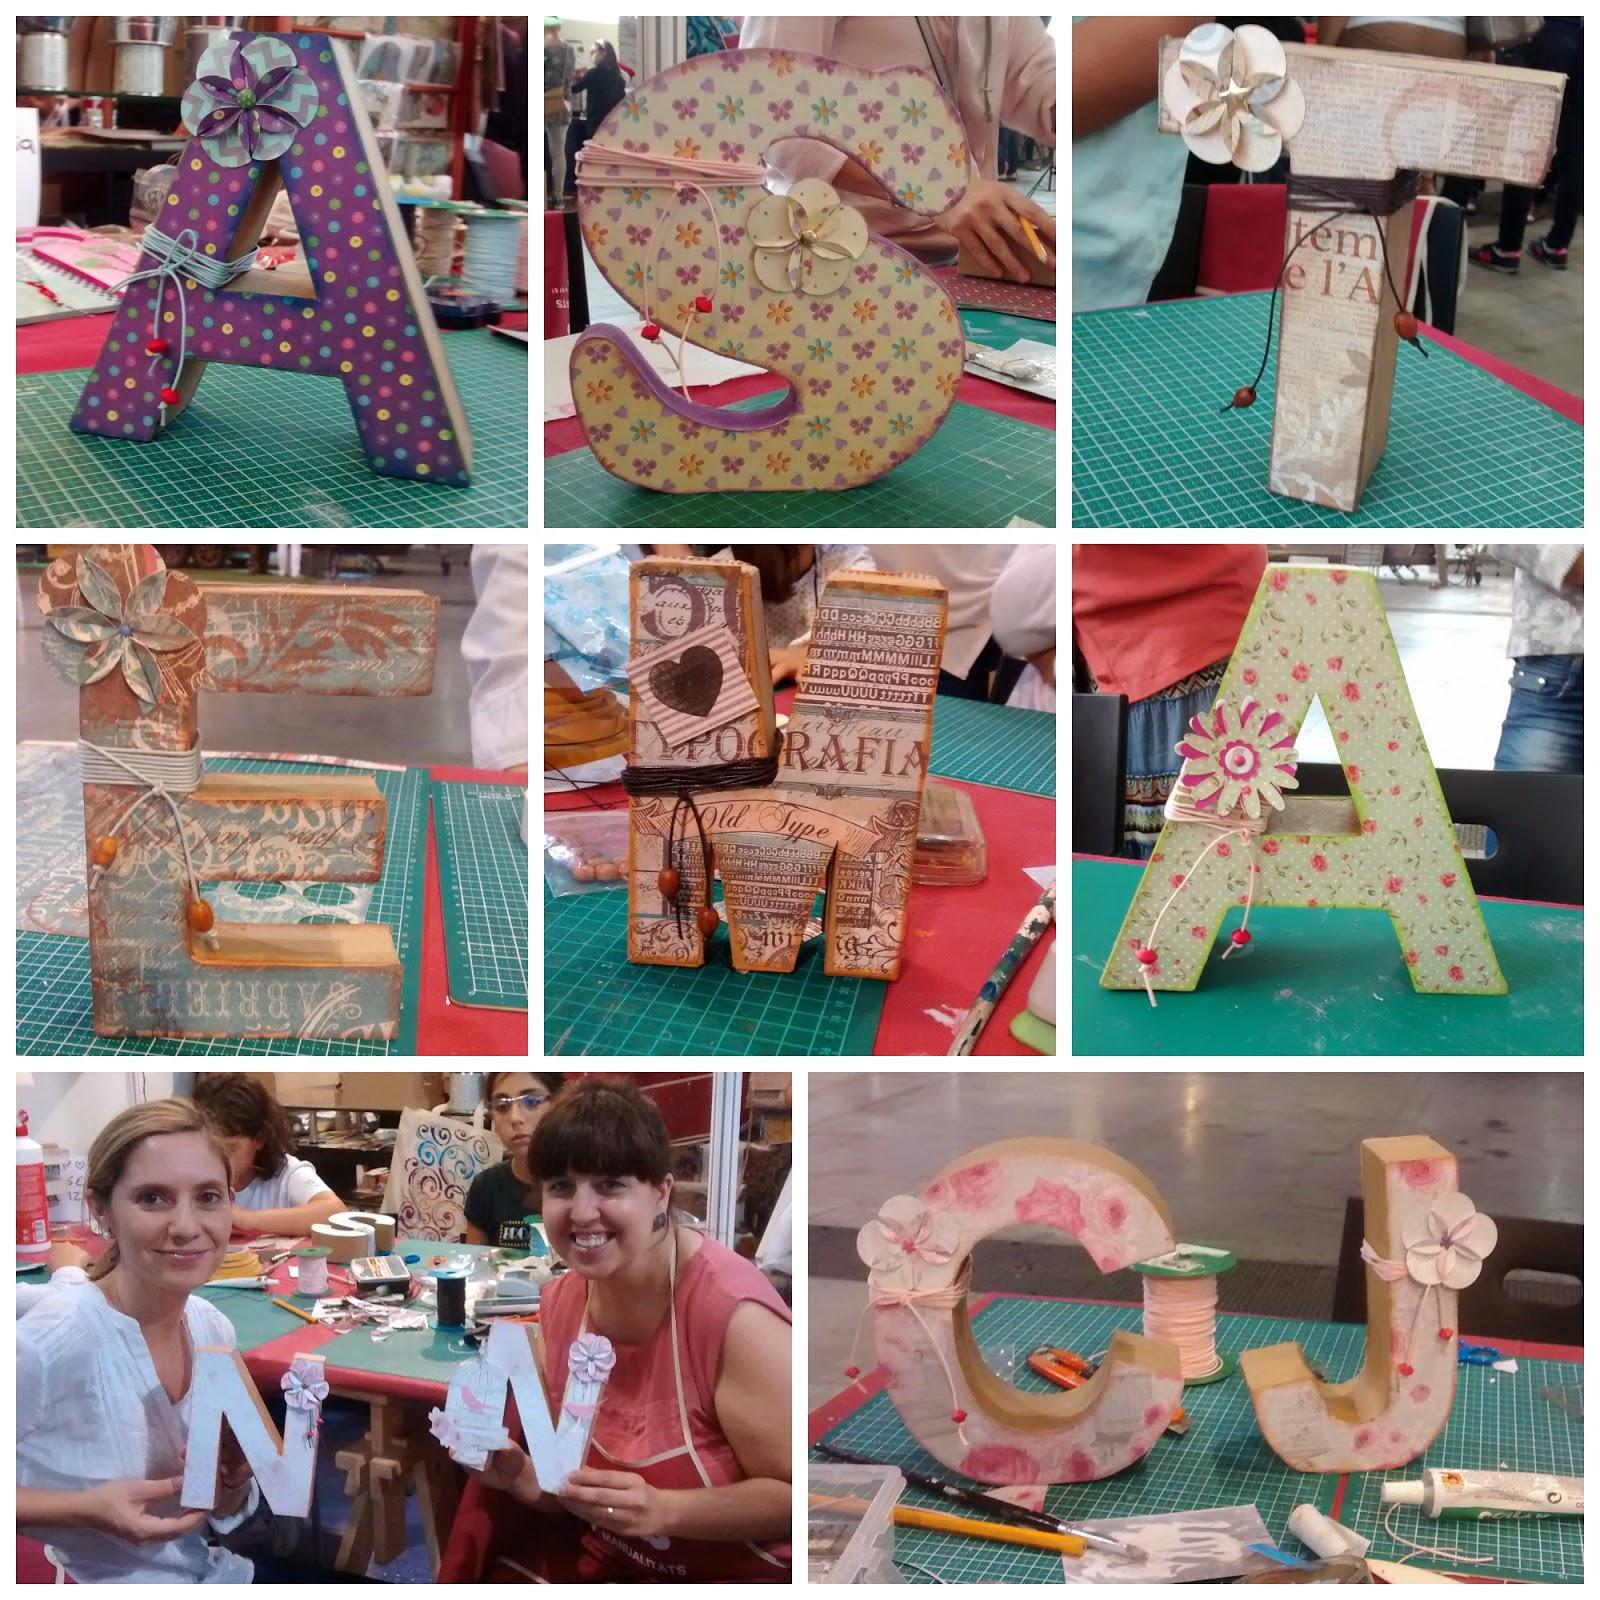 Arte Artesania Y Manualidades Feria Diymania Sabadell 2014 Con